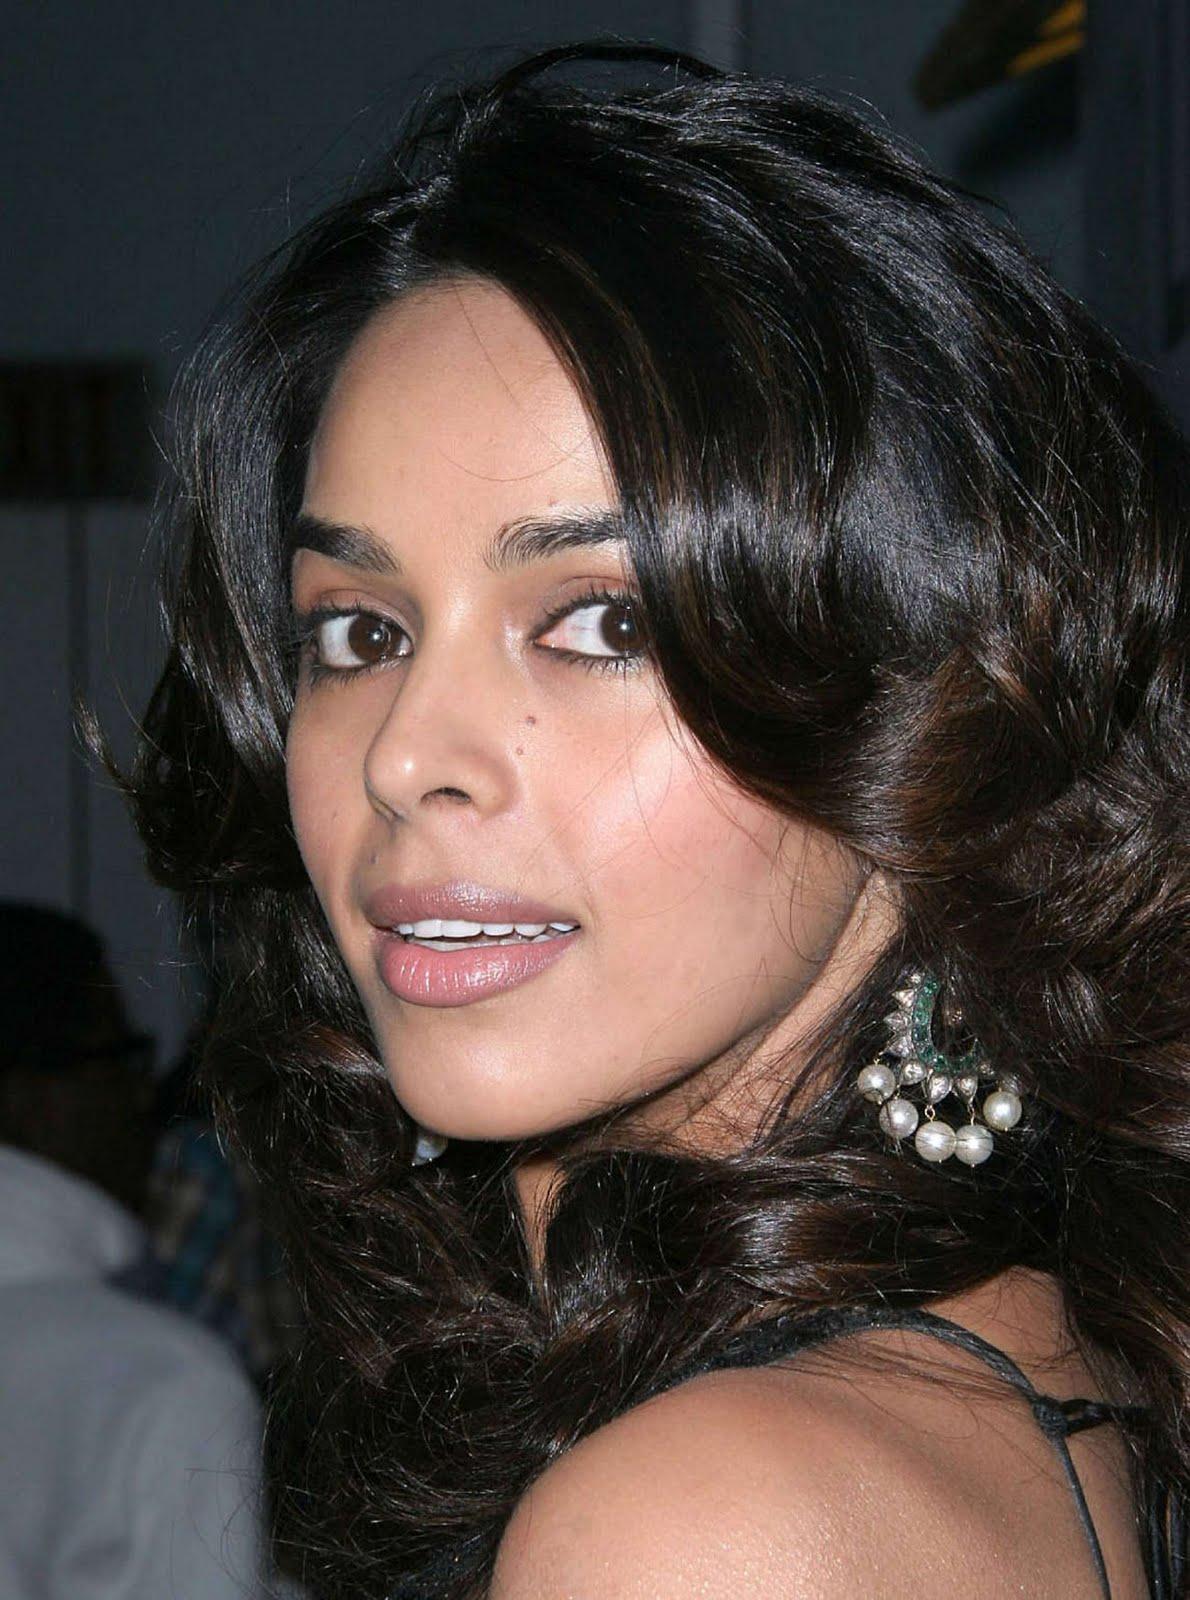 Malika sherawat sexi image-5860